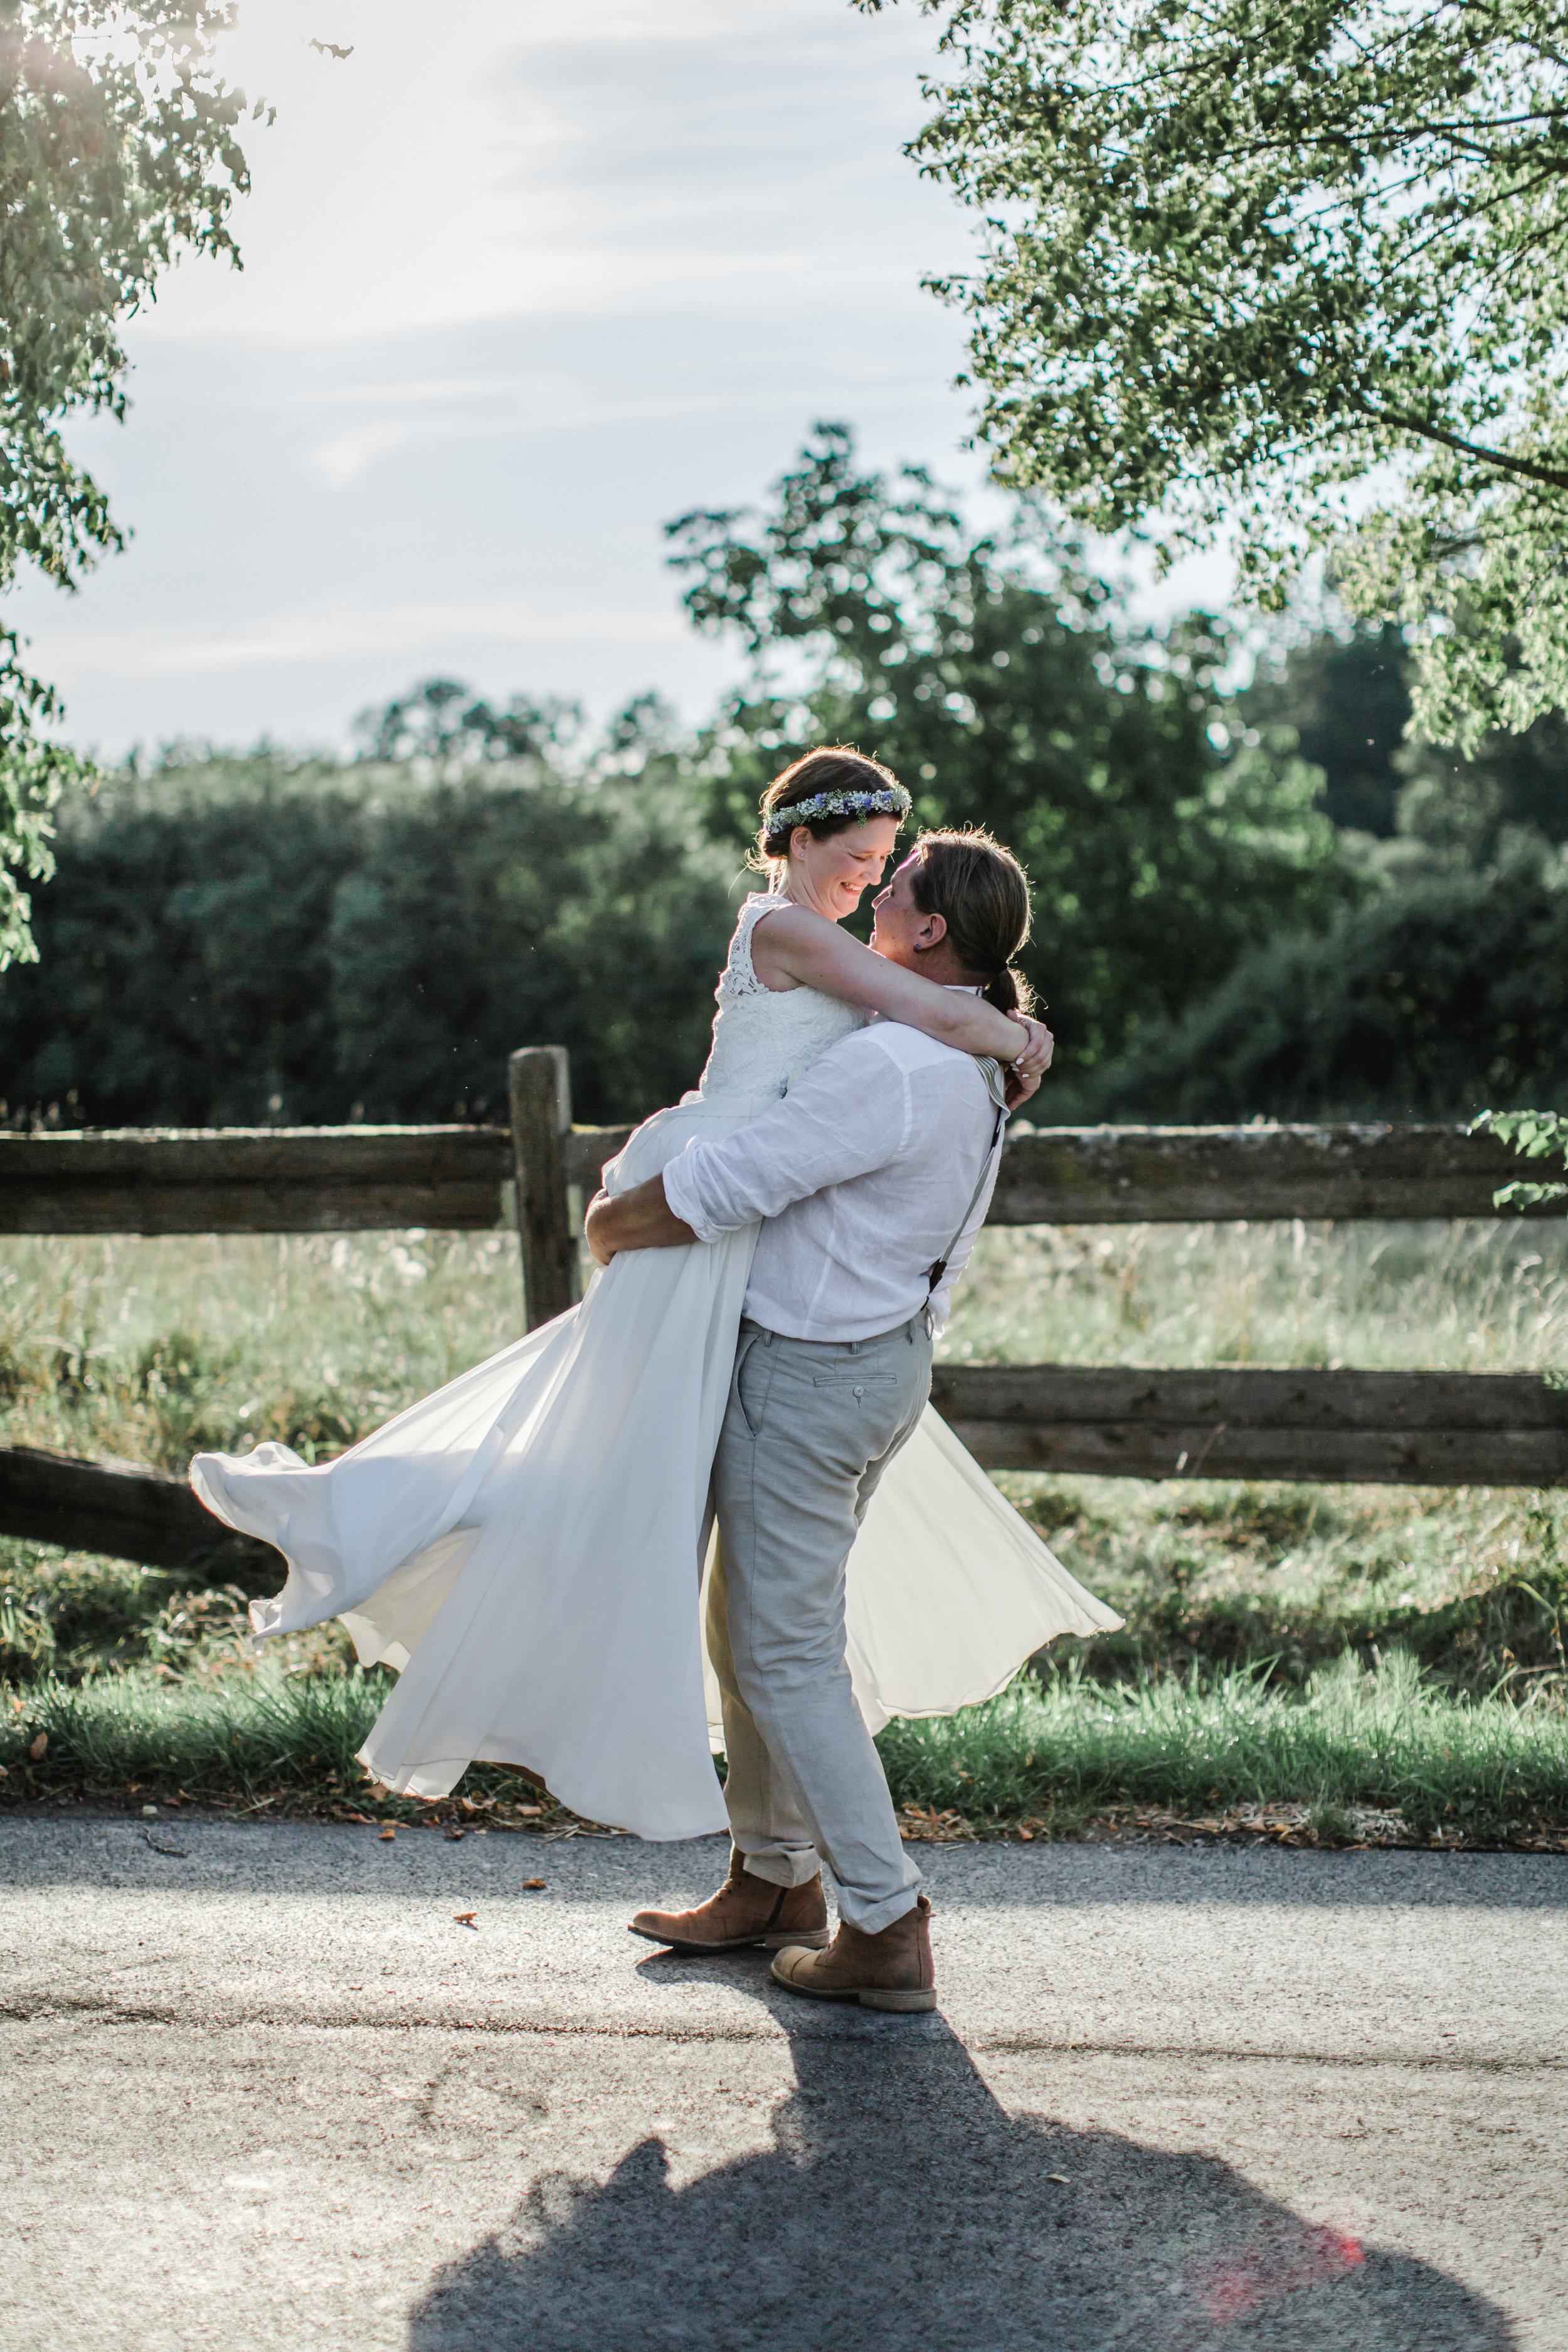 yessica-baur-fotografie-after-wedding-tübingen-053-9358.JPG